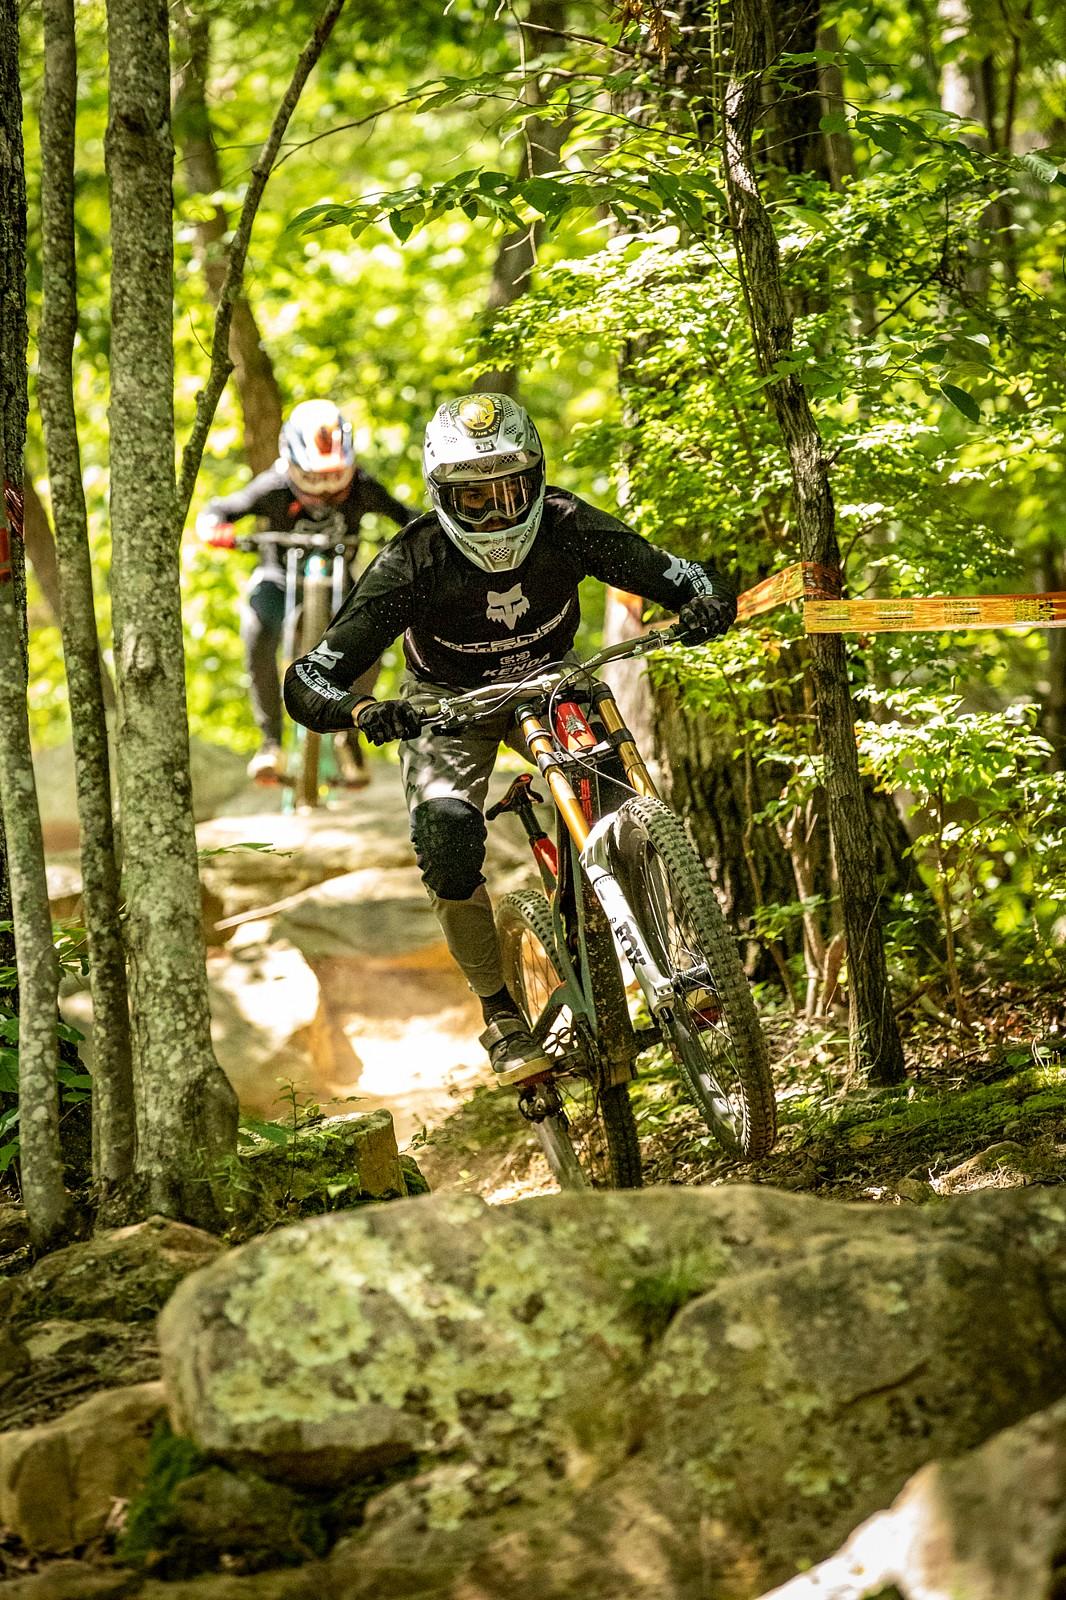 41 - JackRice - Mountain Biking Pictures - Vital MTB